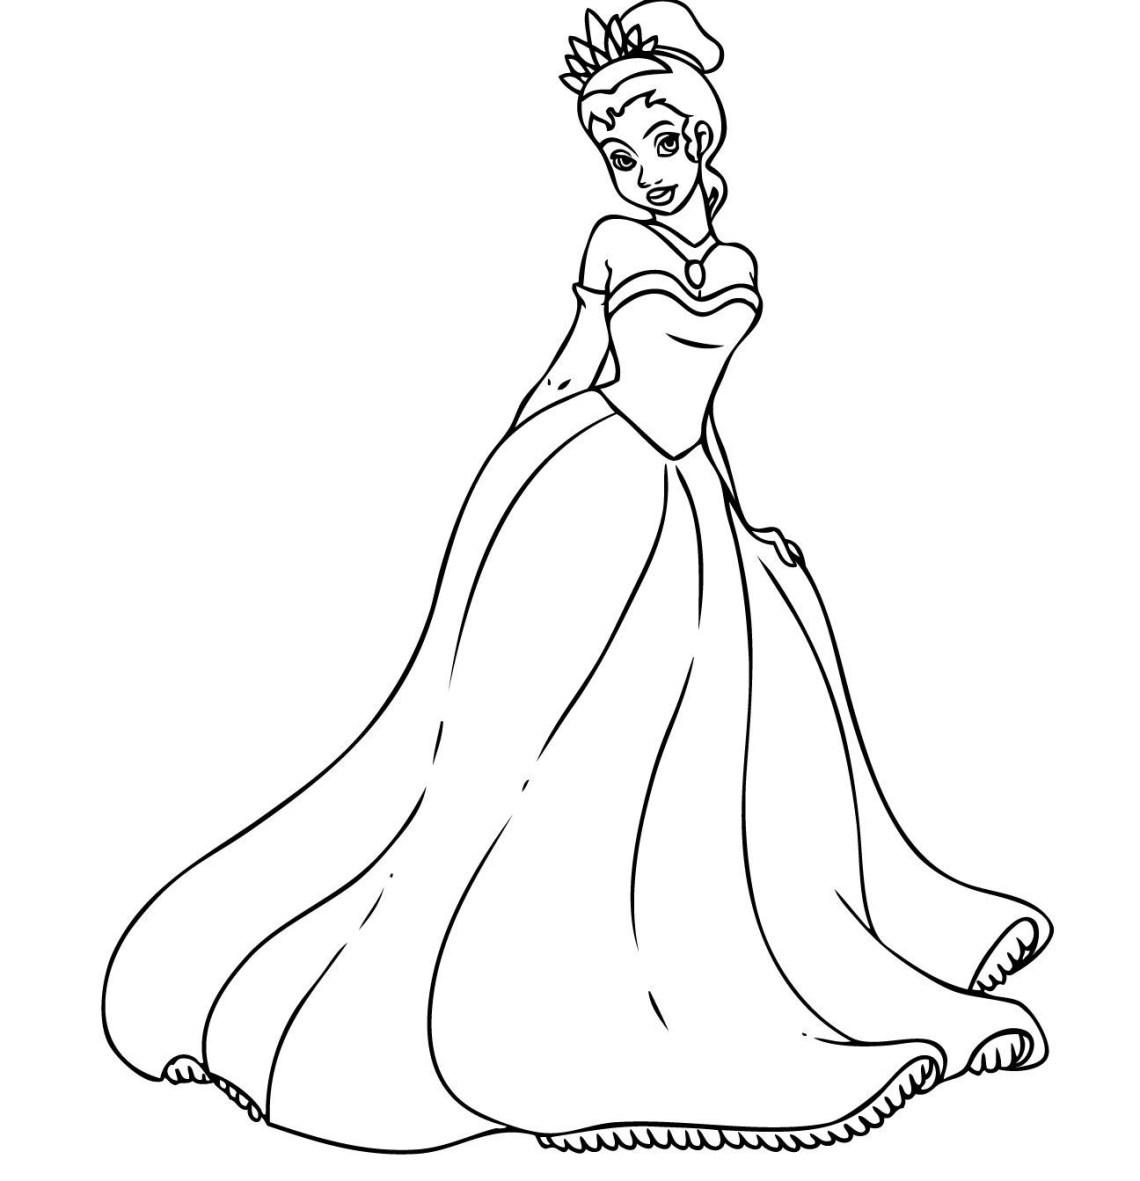 Free Printable Princess Tiana Coloring Pages For Kids   princess tiana printable coloring pages